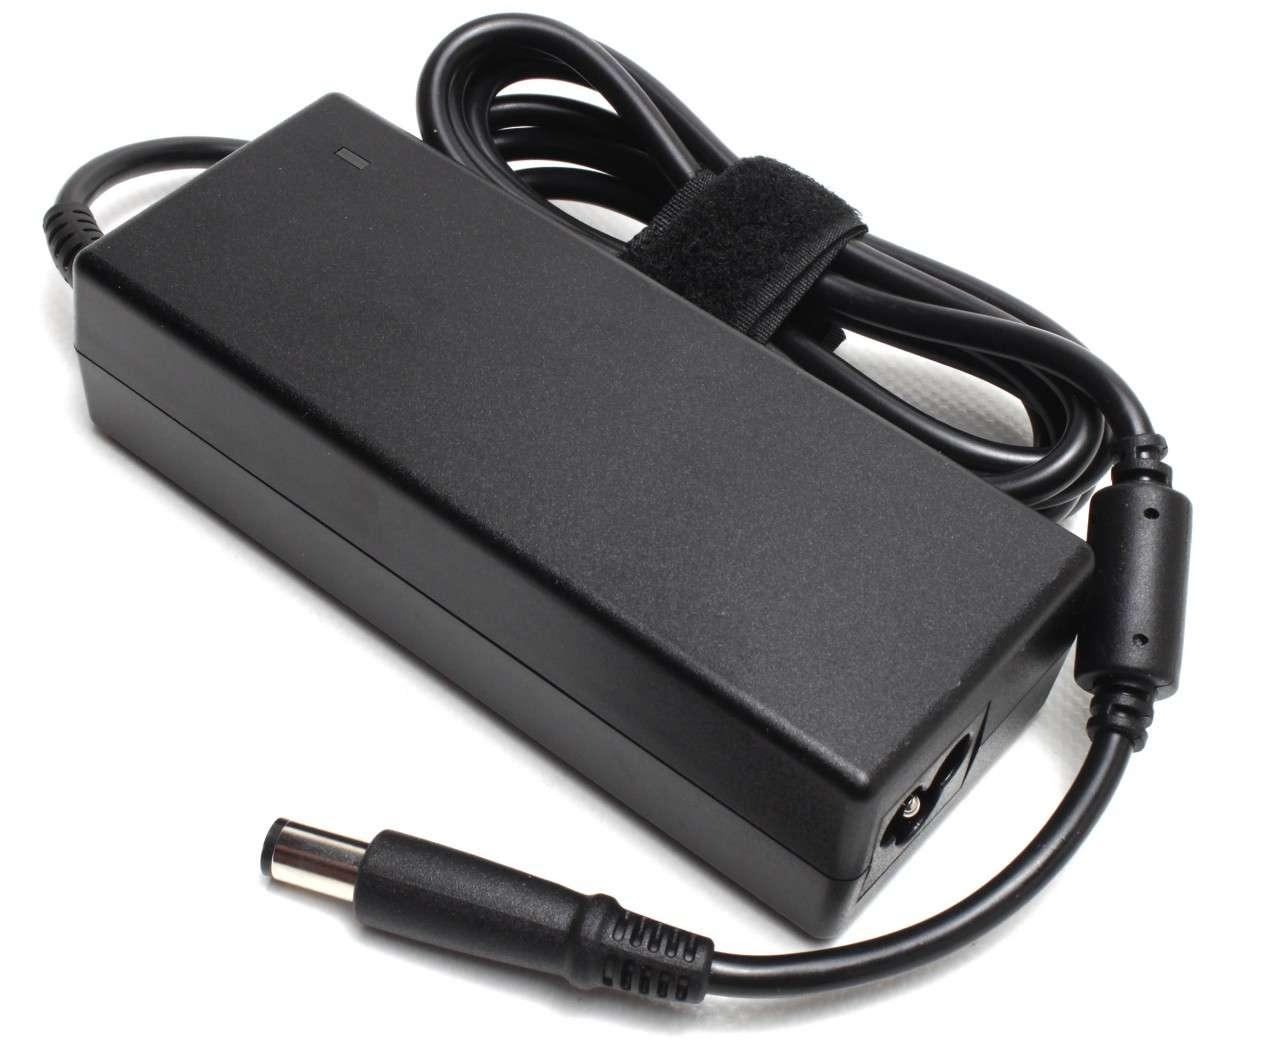 Incarcator Dell Inspiron 9400 VARIANTA 3 imagine powerlaptop.ro 2021